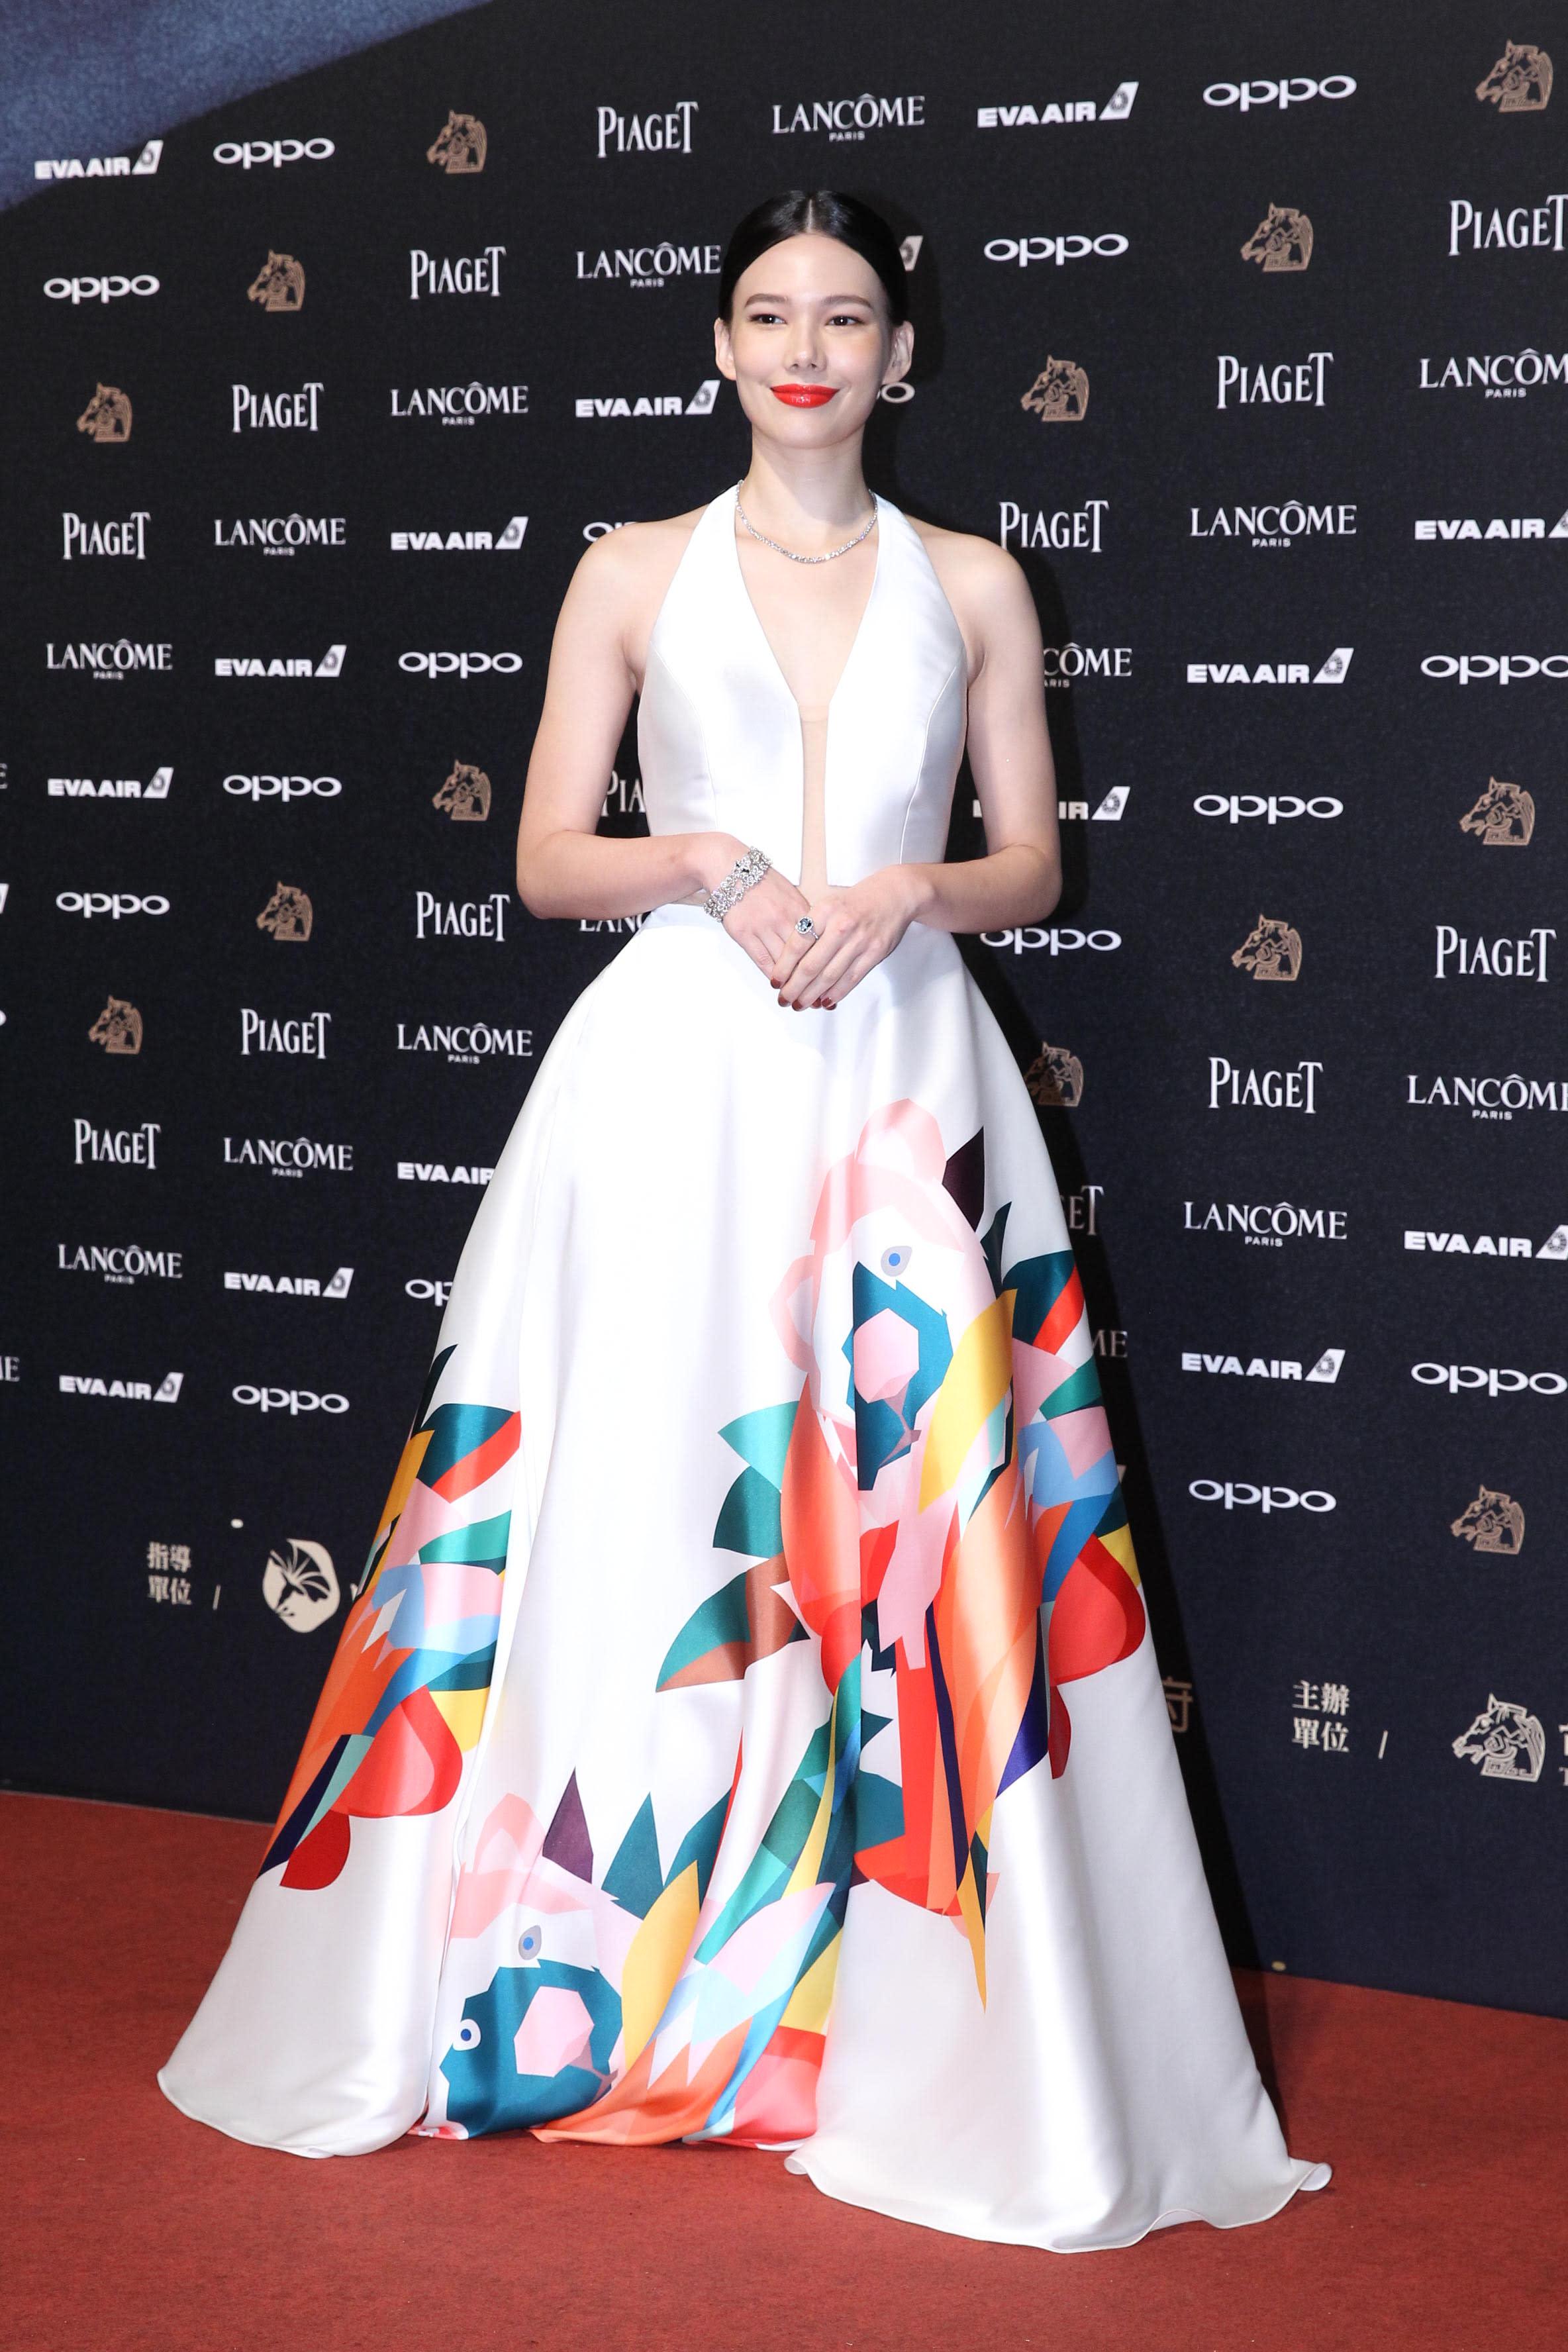 <p>同樣是《接線員》劇組的女星紀培慧,白色禮服上搭配著漂亮的彩色塗鴉,成為本次金馬紅毯的的一大亮點!簡單的中分乾淨髮型,身上搭配Tiffany & Co.珠寶,散發著經典美(達志影像) </p>